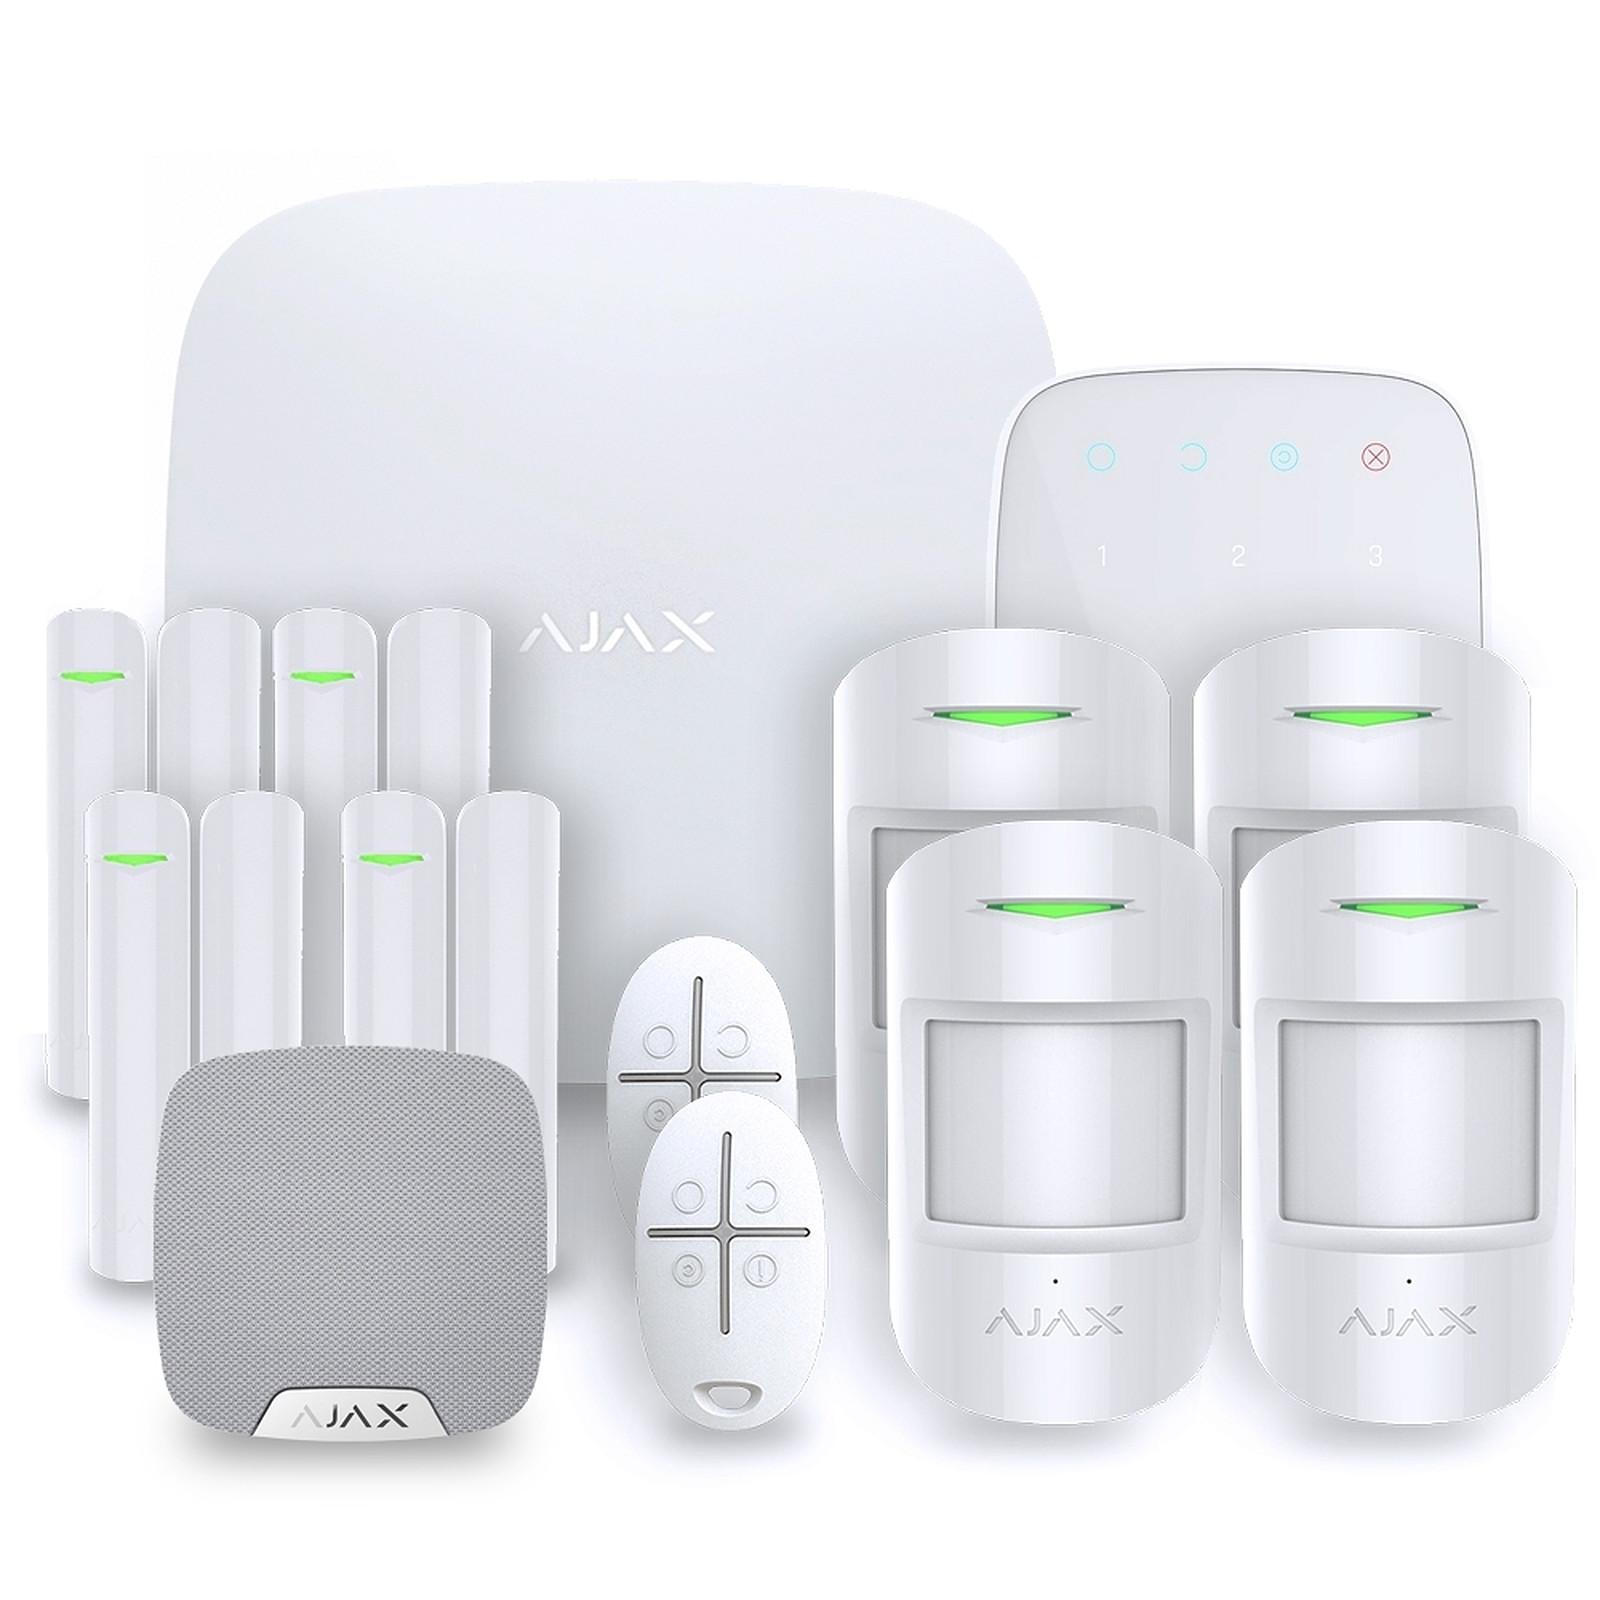 Ajax Alarme maison StarterKit blanc  Kit 4